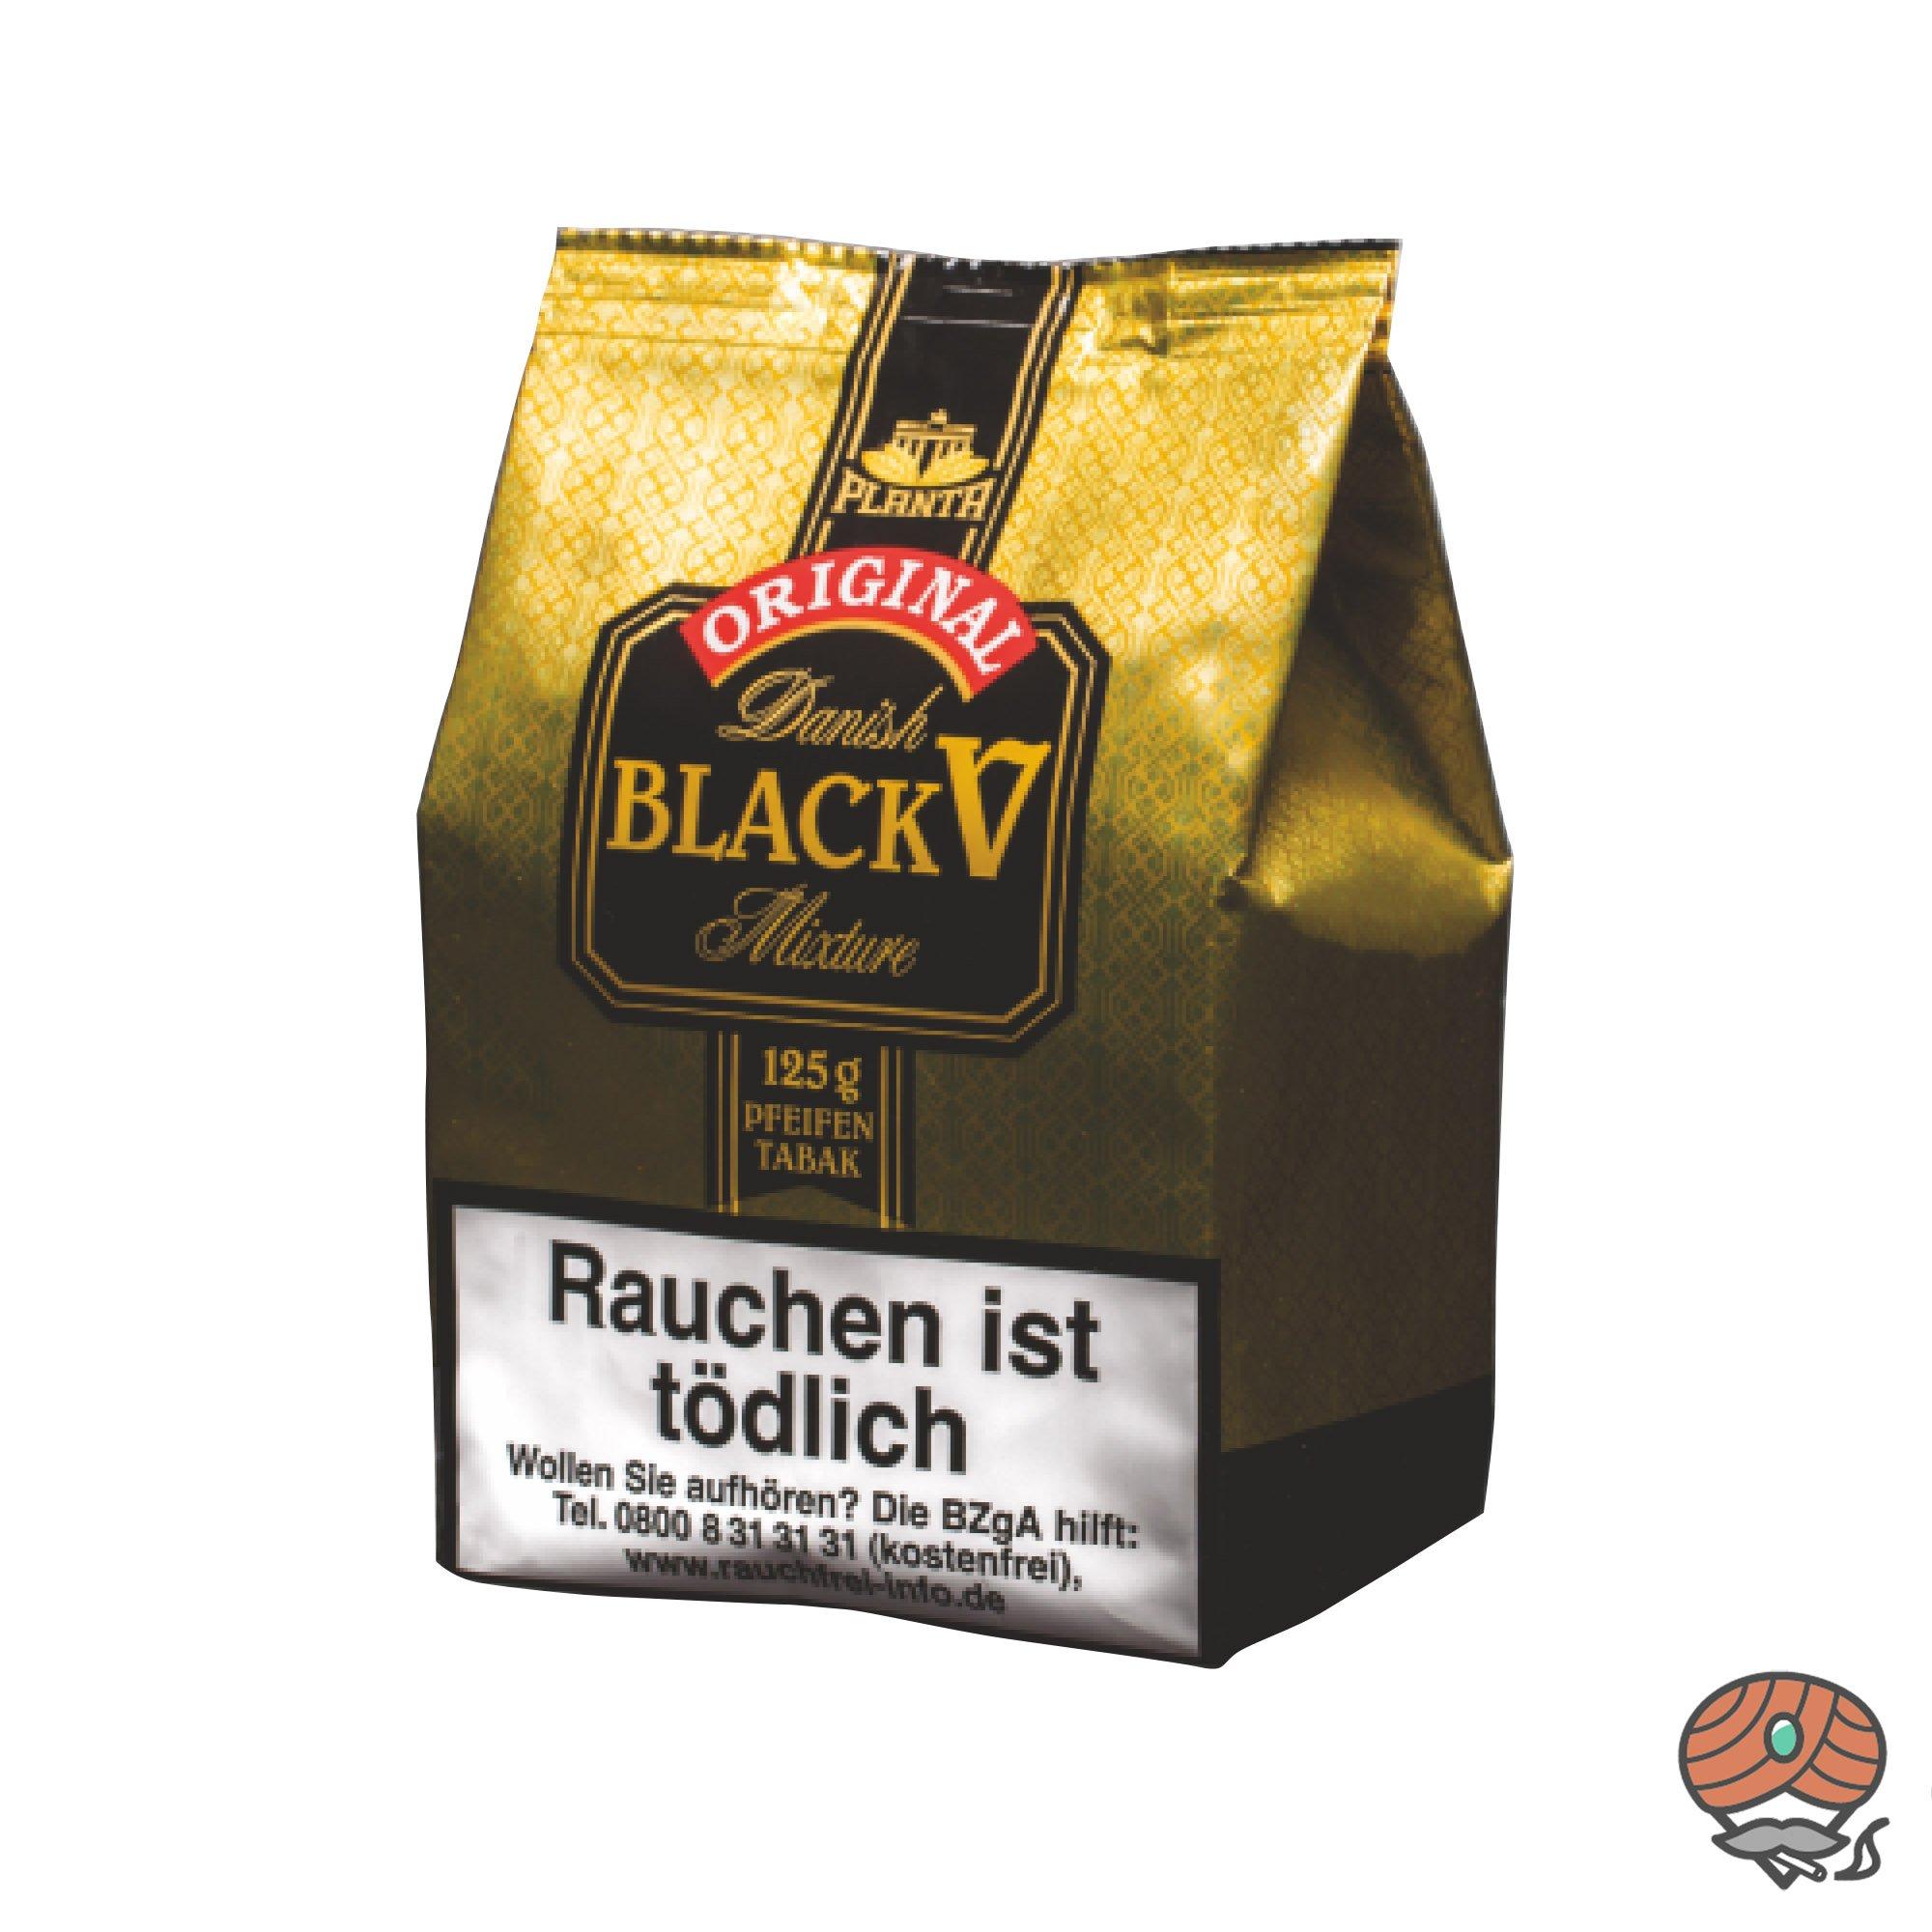 Danish Black V Pfeifentabak Vanille Aroma 125g Beutel